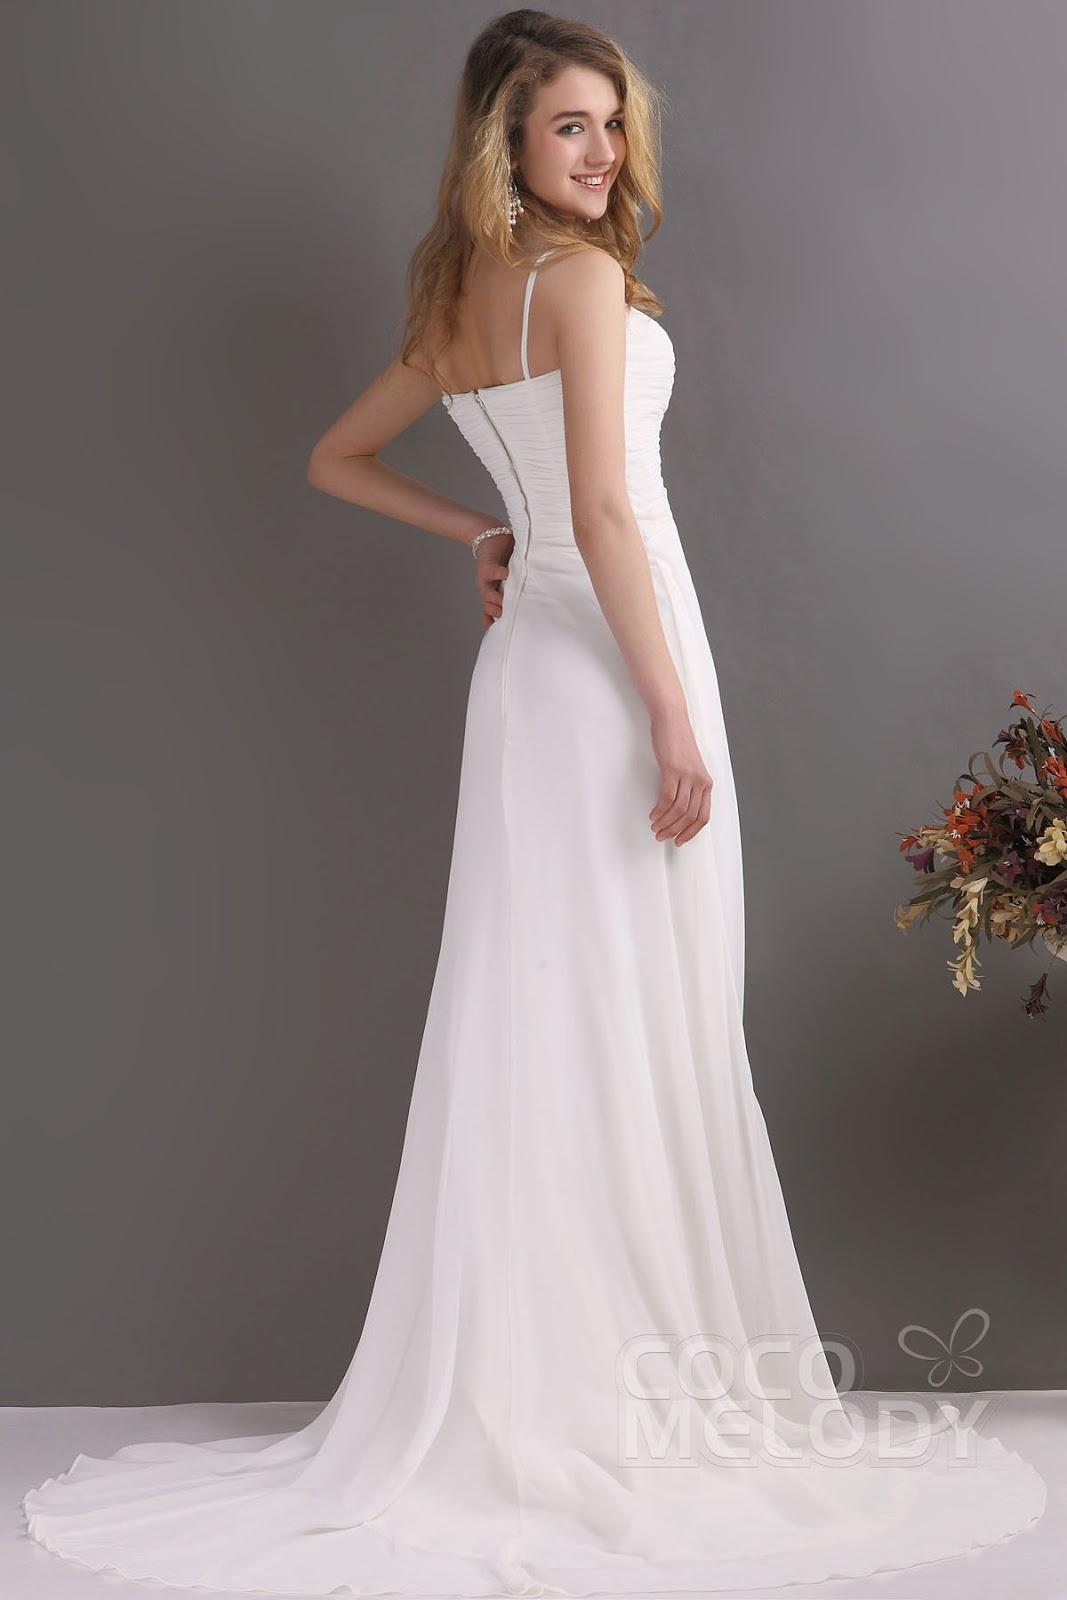 cocomelodygown: Straightforward wedding dress can build a good ...